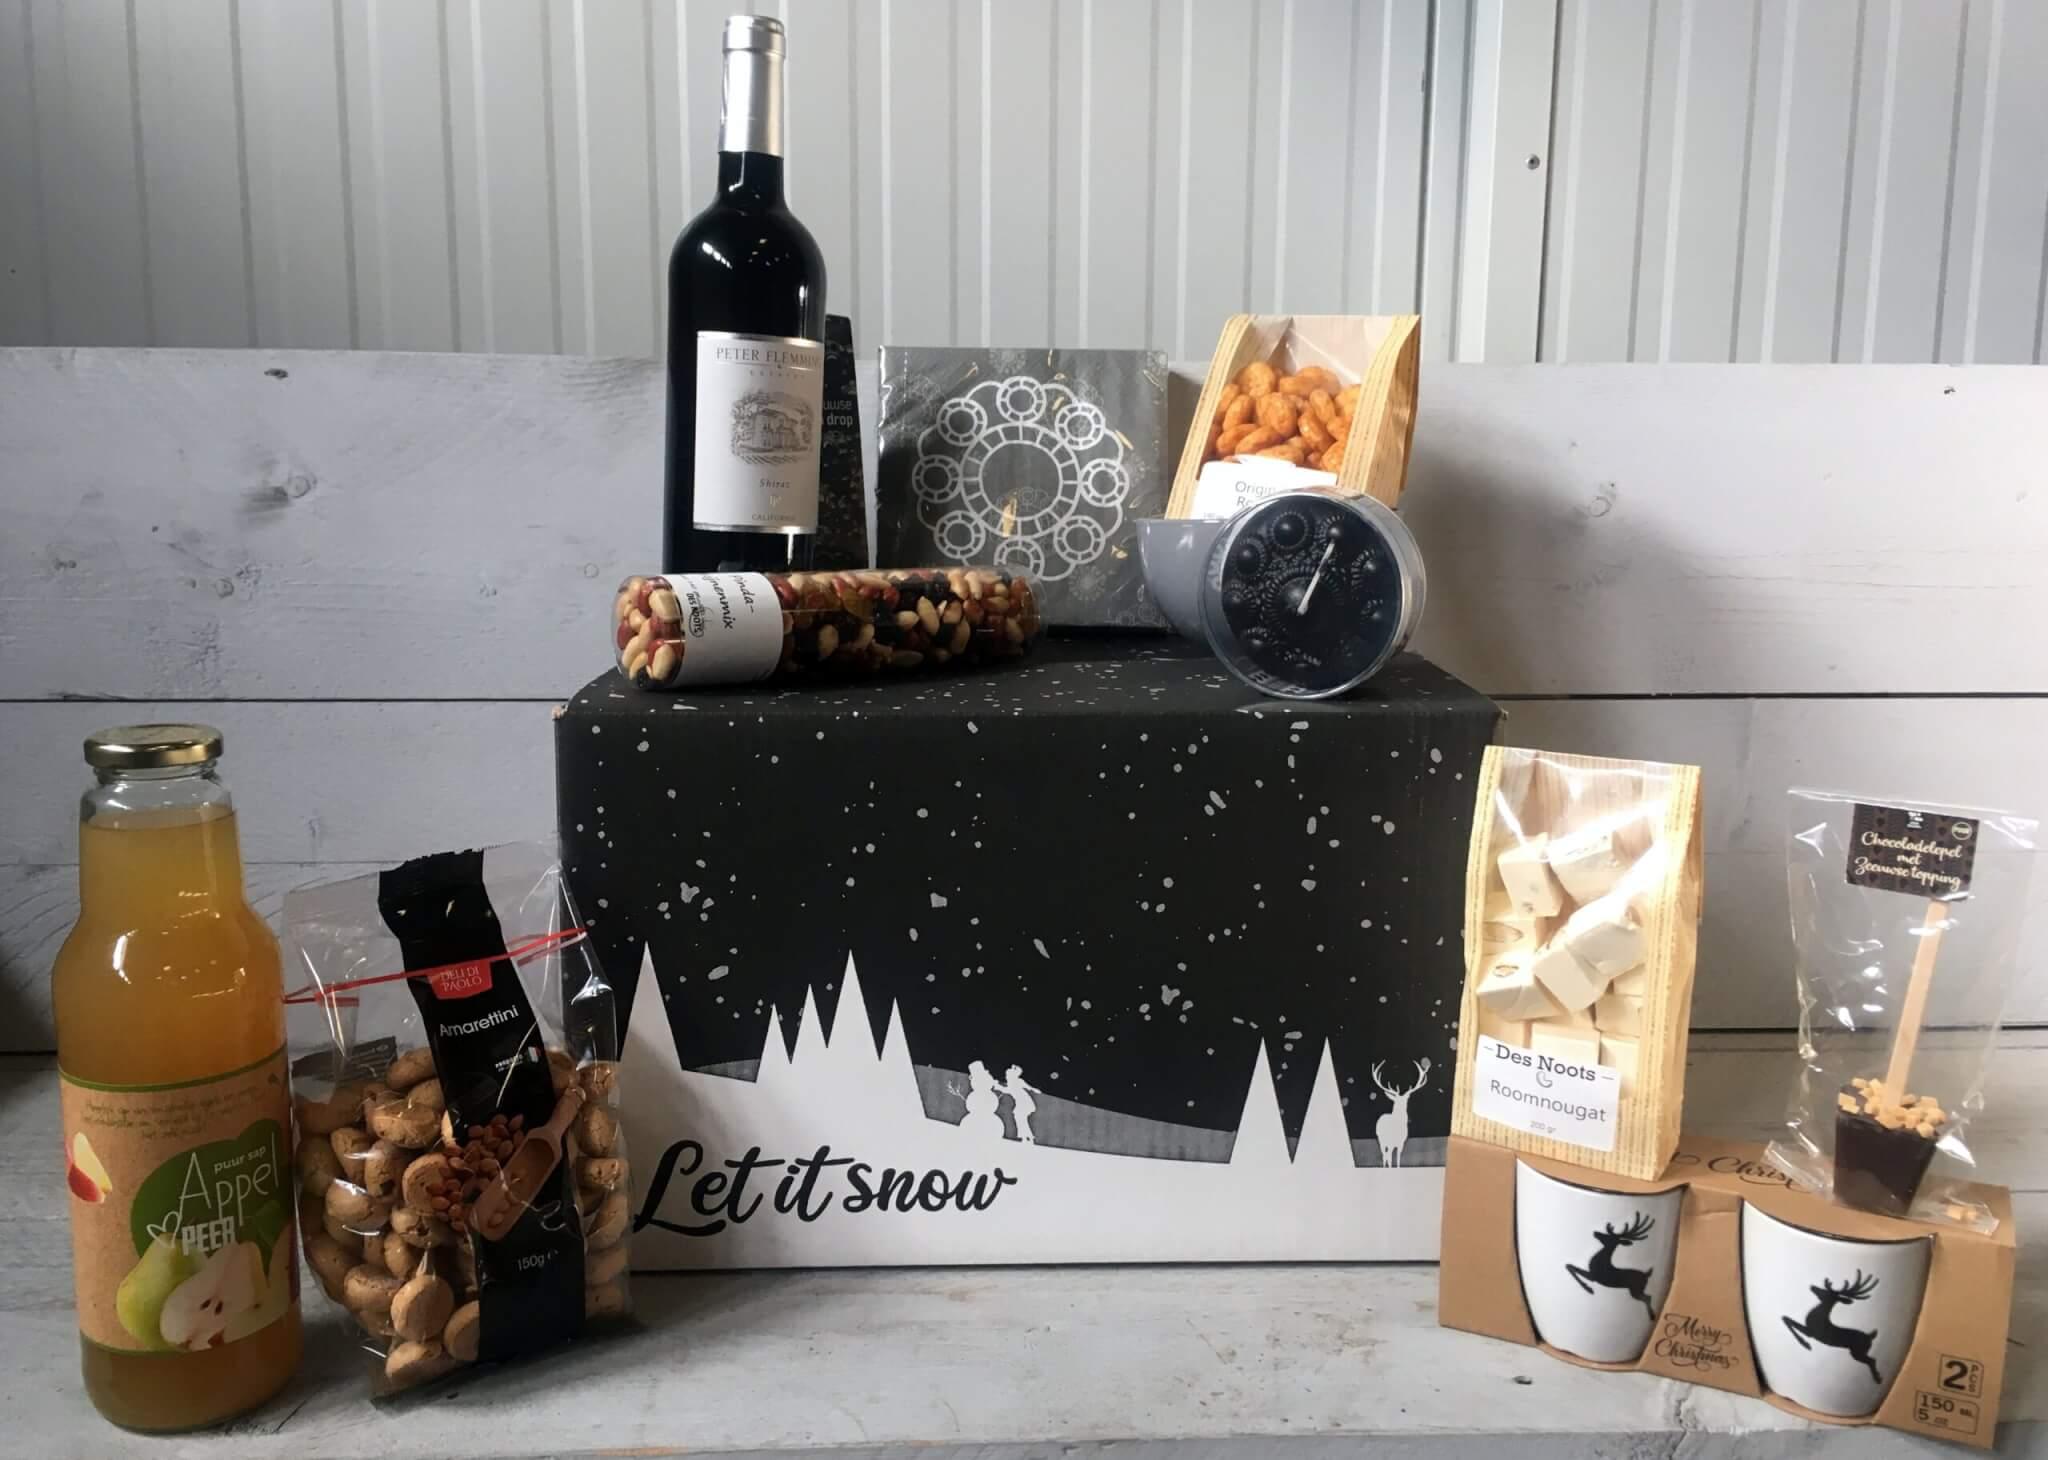 Fruitbedrijf Van den Berge: Kerstpakketten 2020 Let it snow